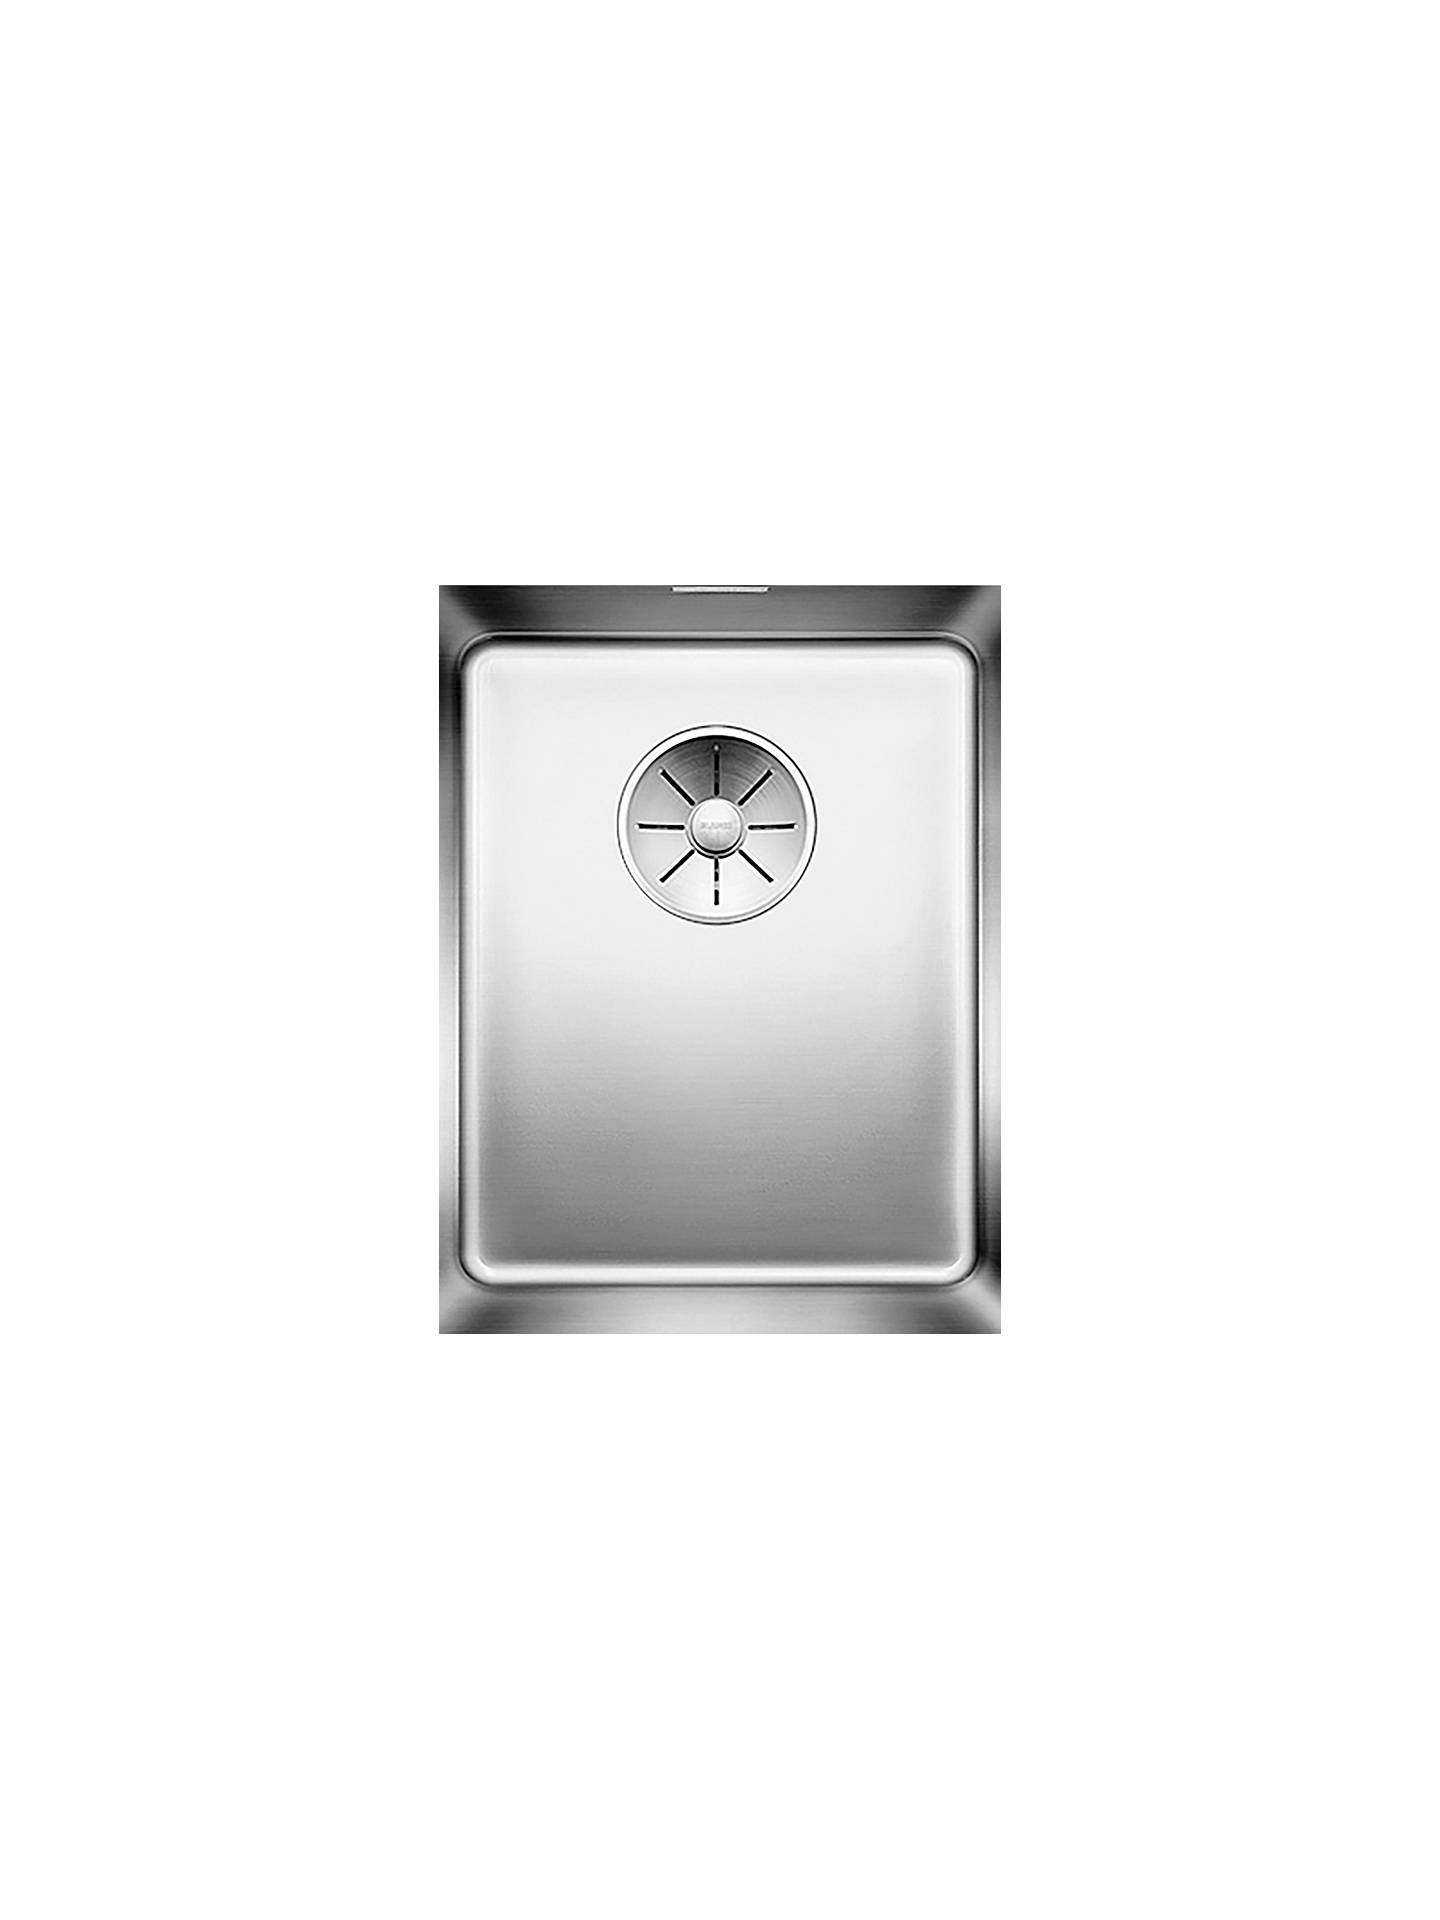 Blanco Andano 340-IF Single Bowl Inset Kitchen Sink